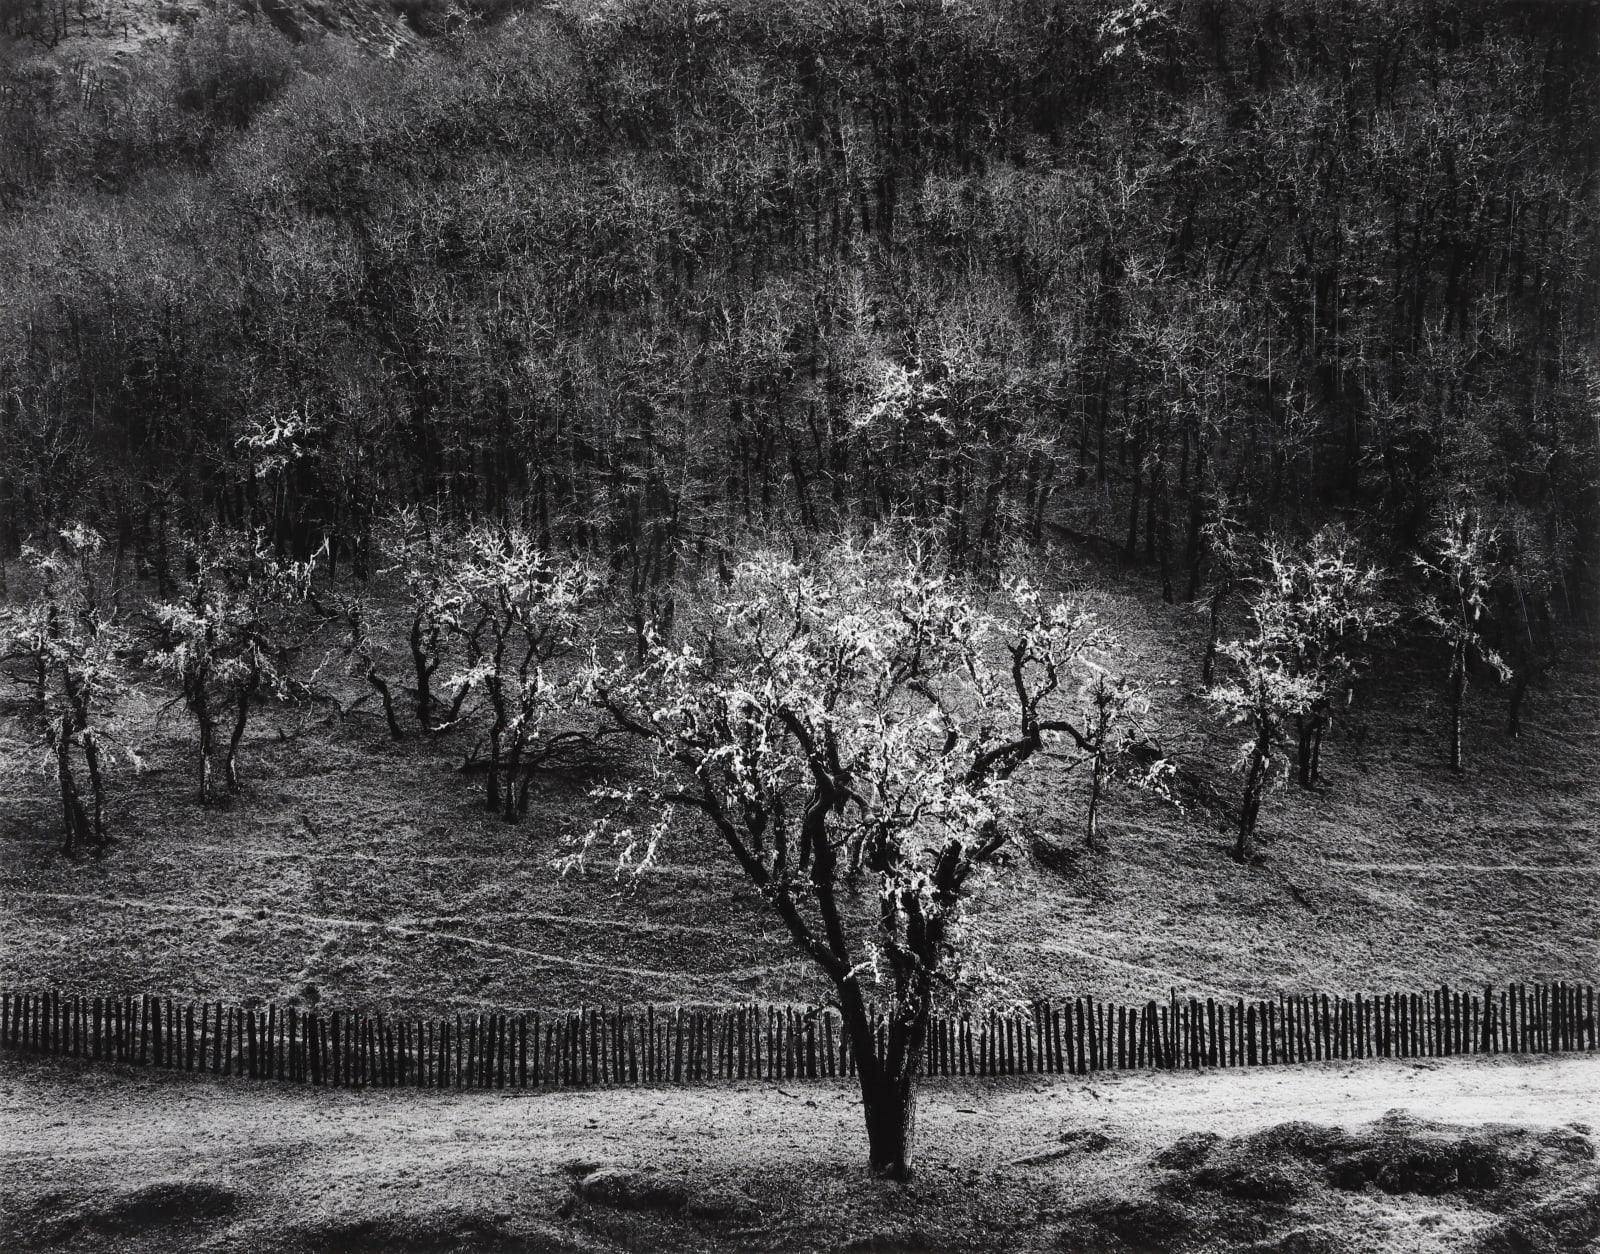 Ansel Adams, Oak Tree, Rain, Sonoma County, California, 1960